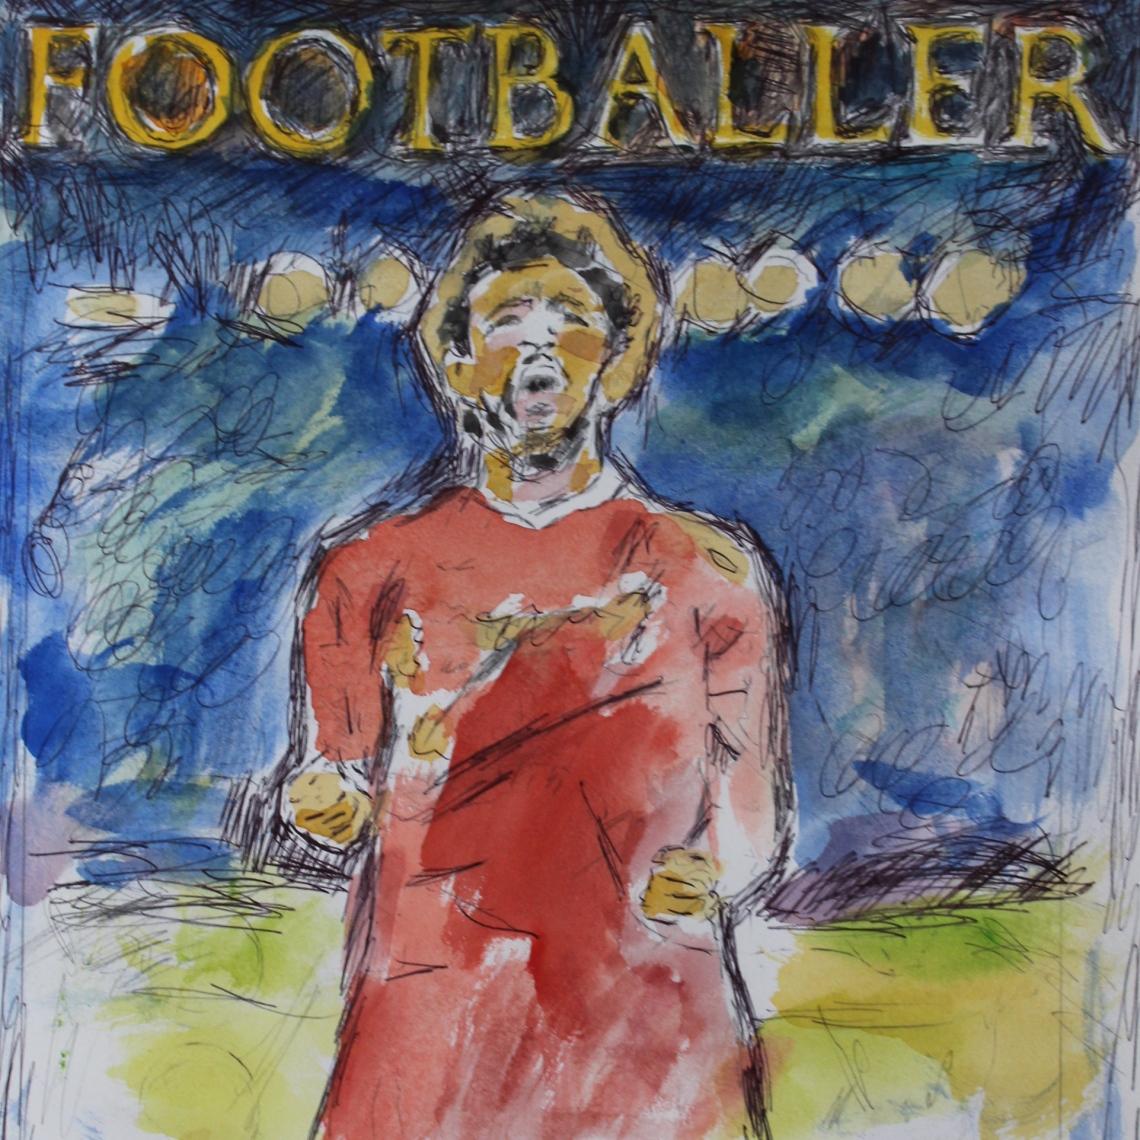 footballer gladiator